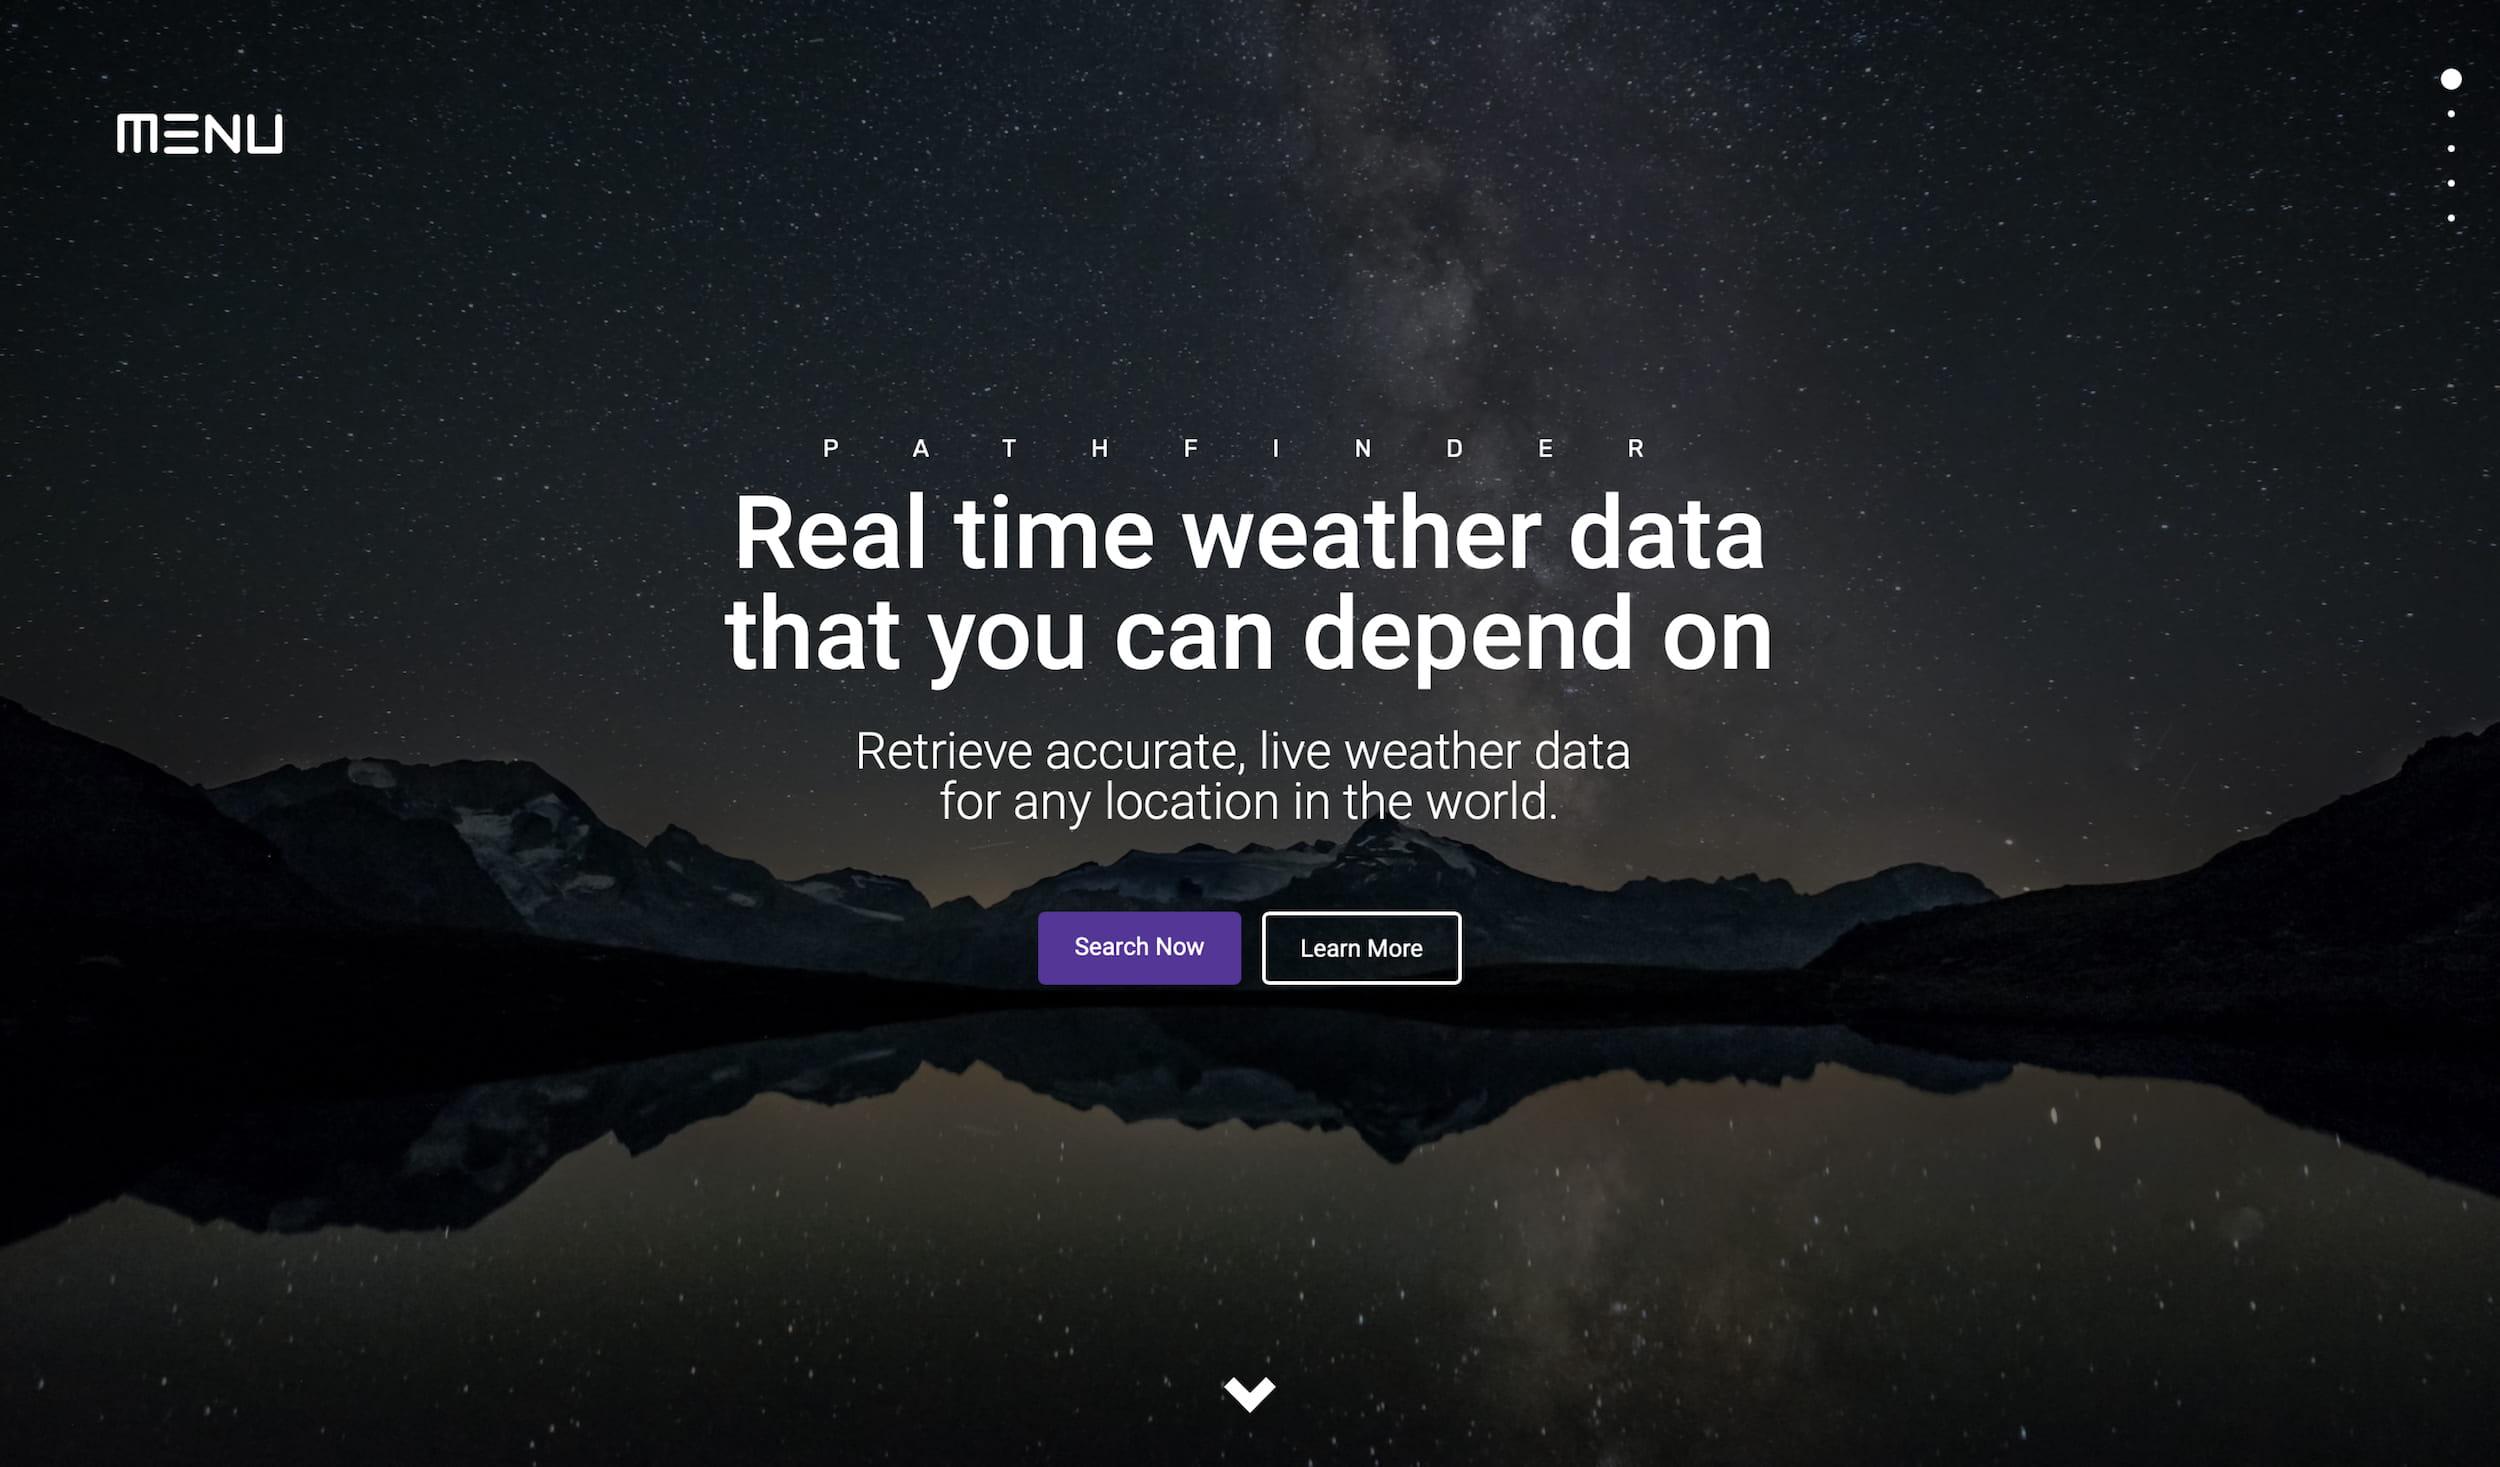 Pathfinder Weather